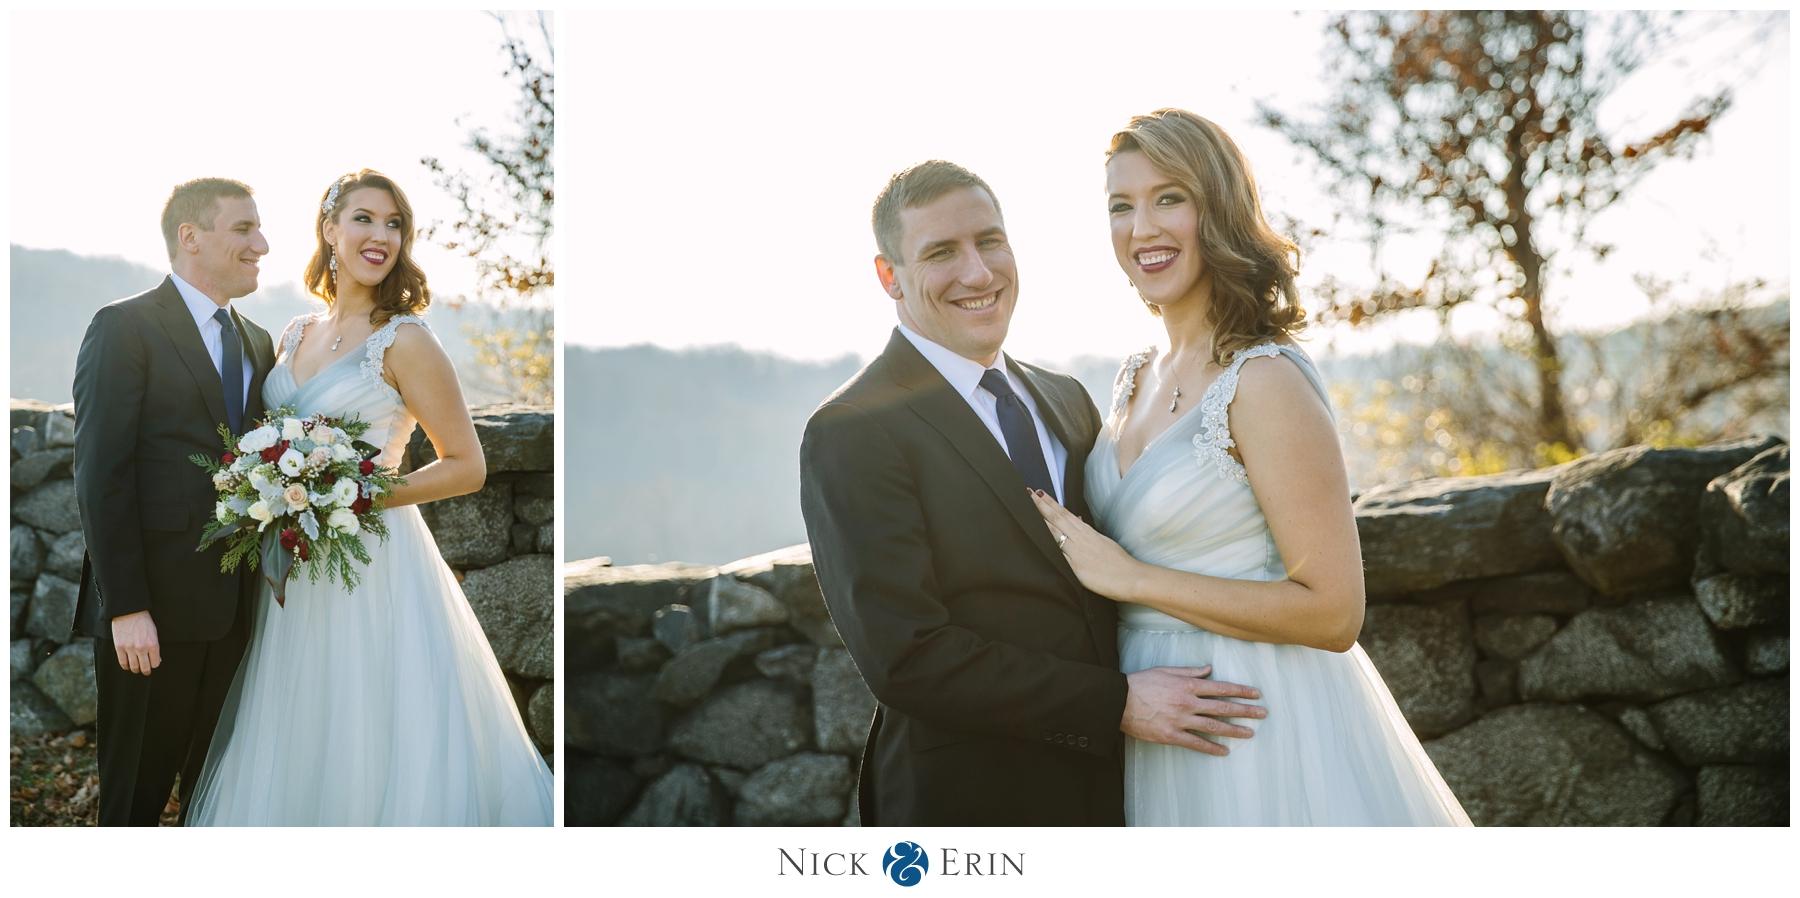 Donner_Photography_Mendenhall Inn Wedding_Blake & Kristina_0008